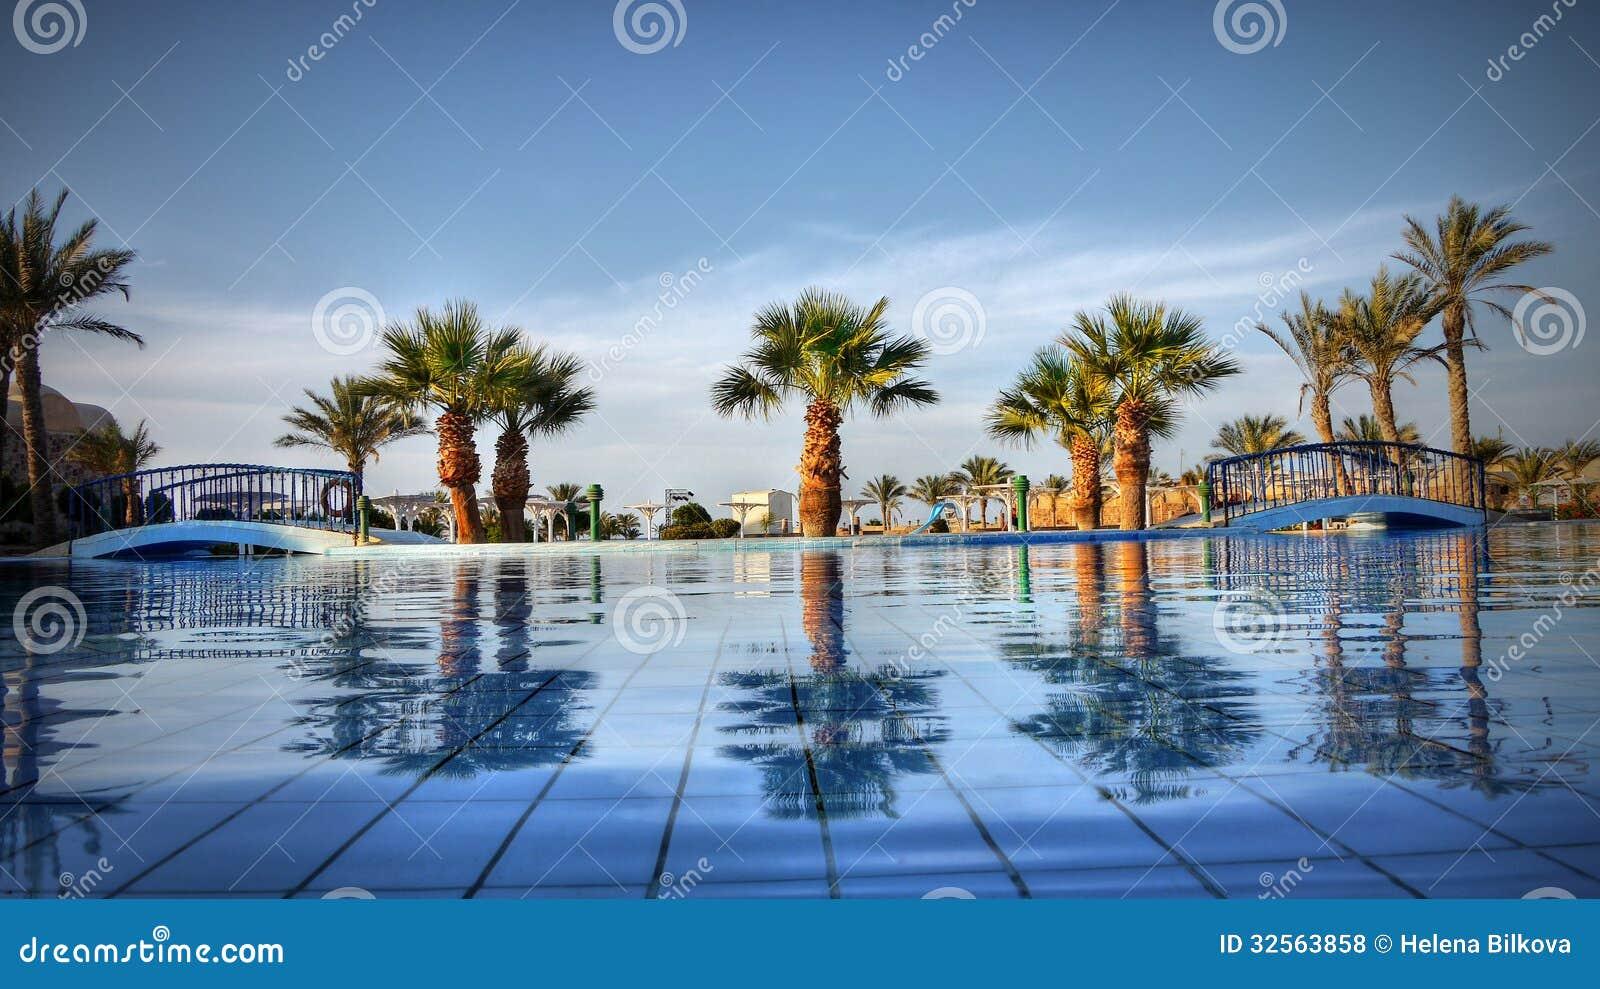 Palms Blue Water Luxury Garden Egypt Stock Photo Image 32563858